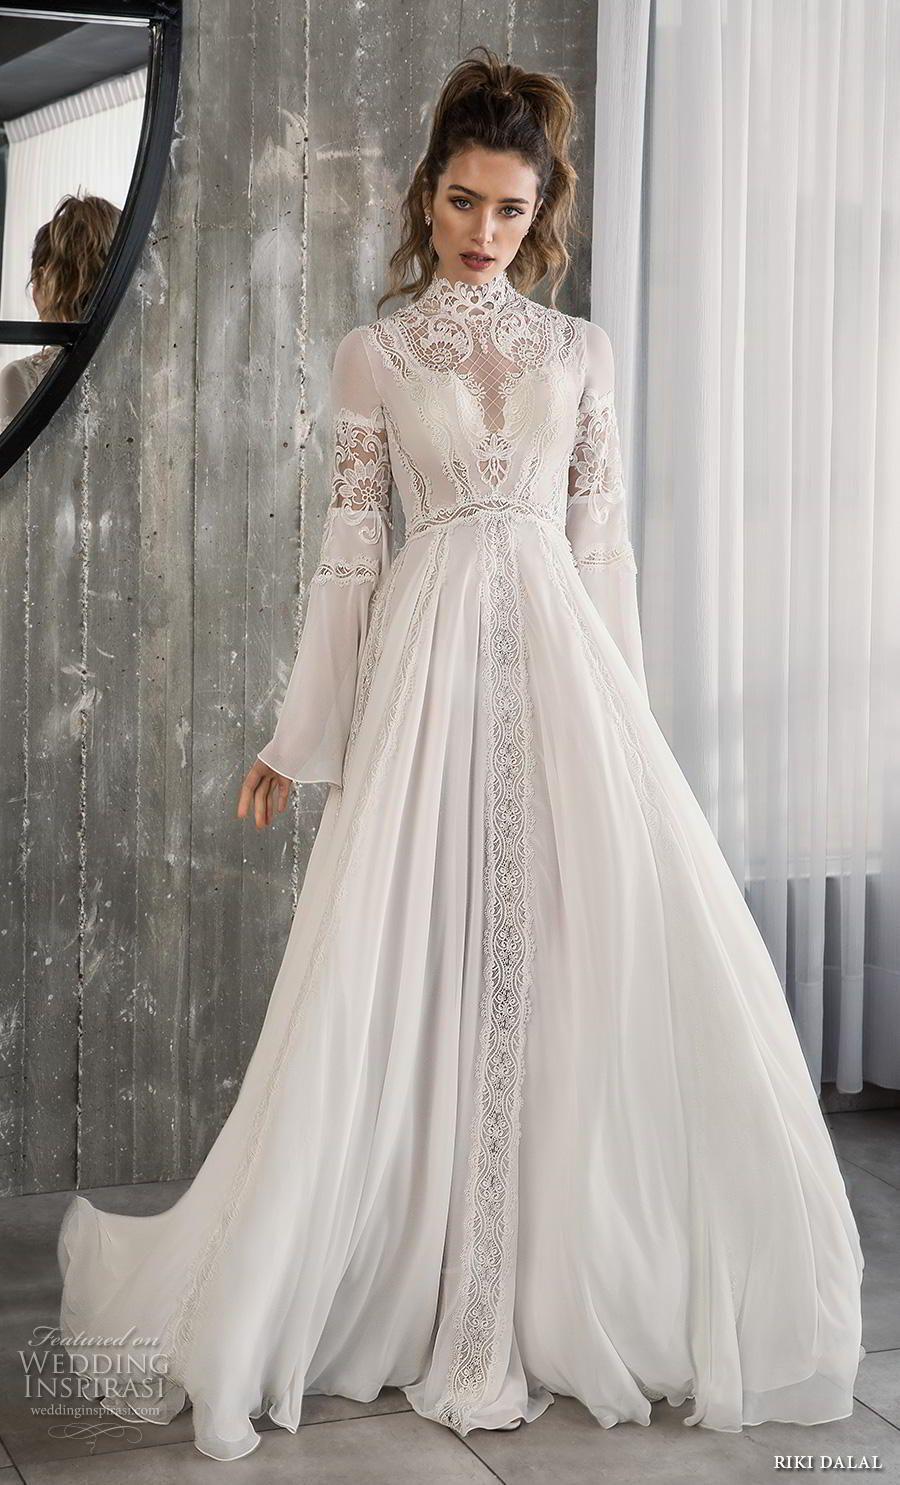 578a2654e229 riki dalal 2018 glamour bridal long bell sleeves high neck heavily  embellished bodice romantic bohemian a